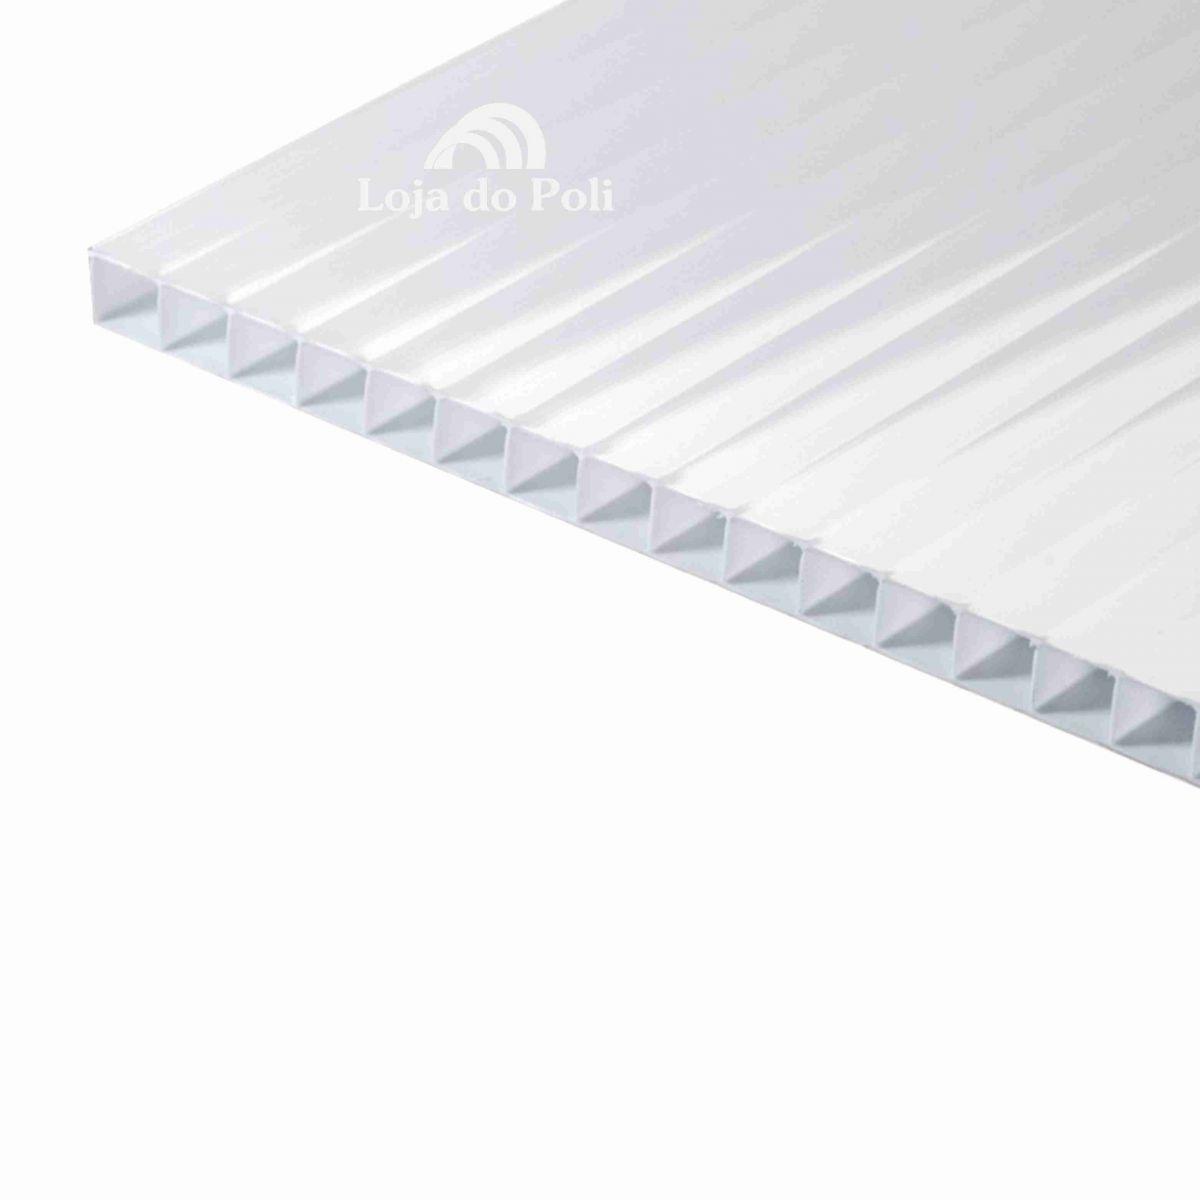 Chapa Policarbonato Alveolar Pérola Solar Reflective 6mm 2,1x6,0m